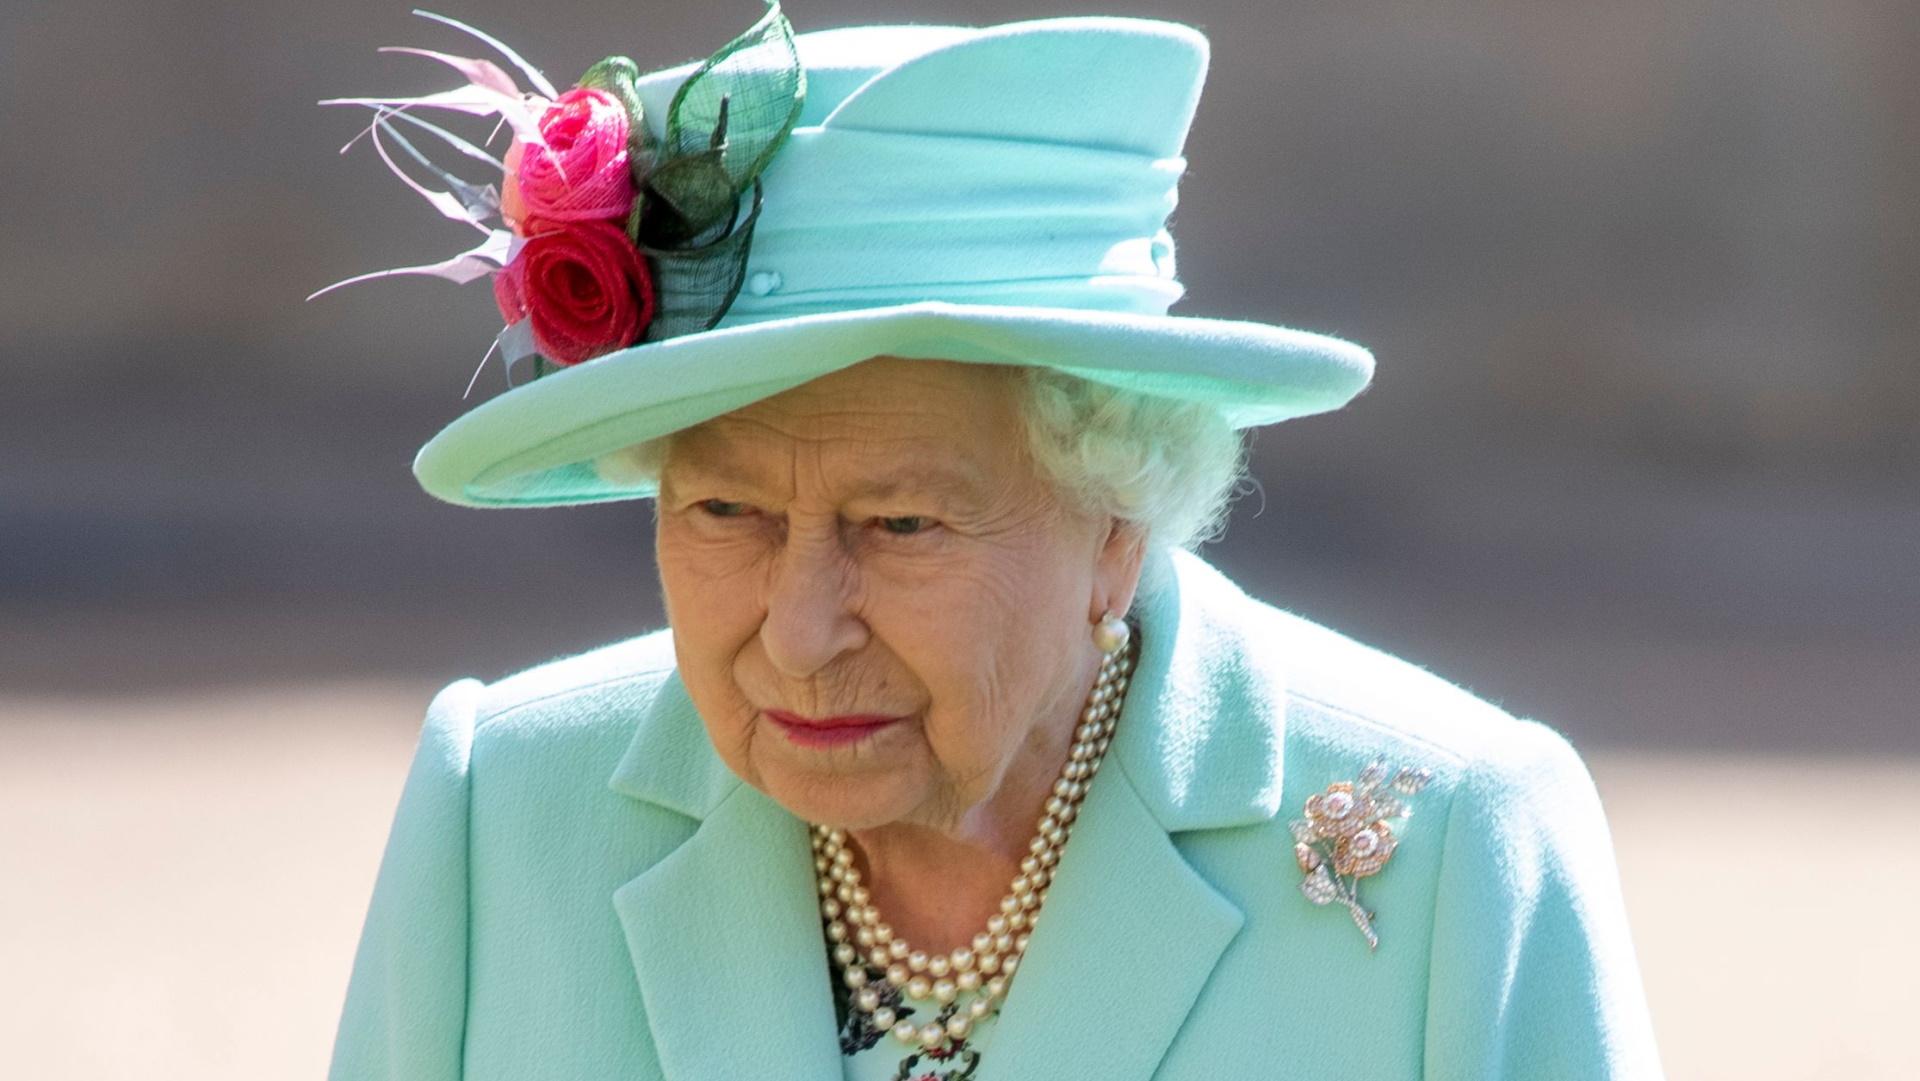 Елизавета II наградила производителя секс-игрушек